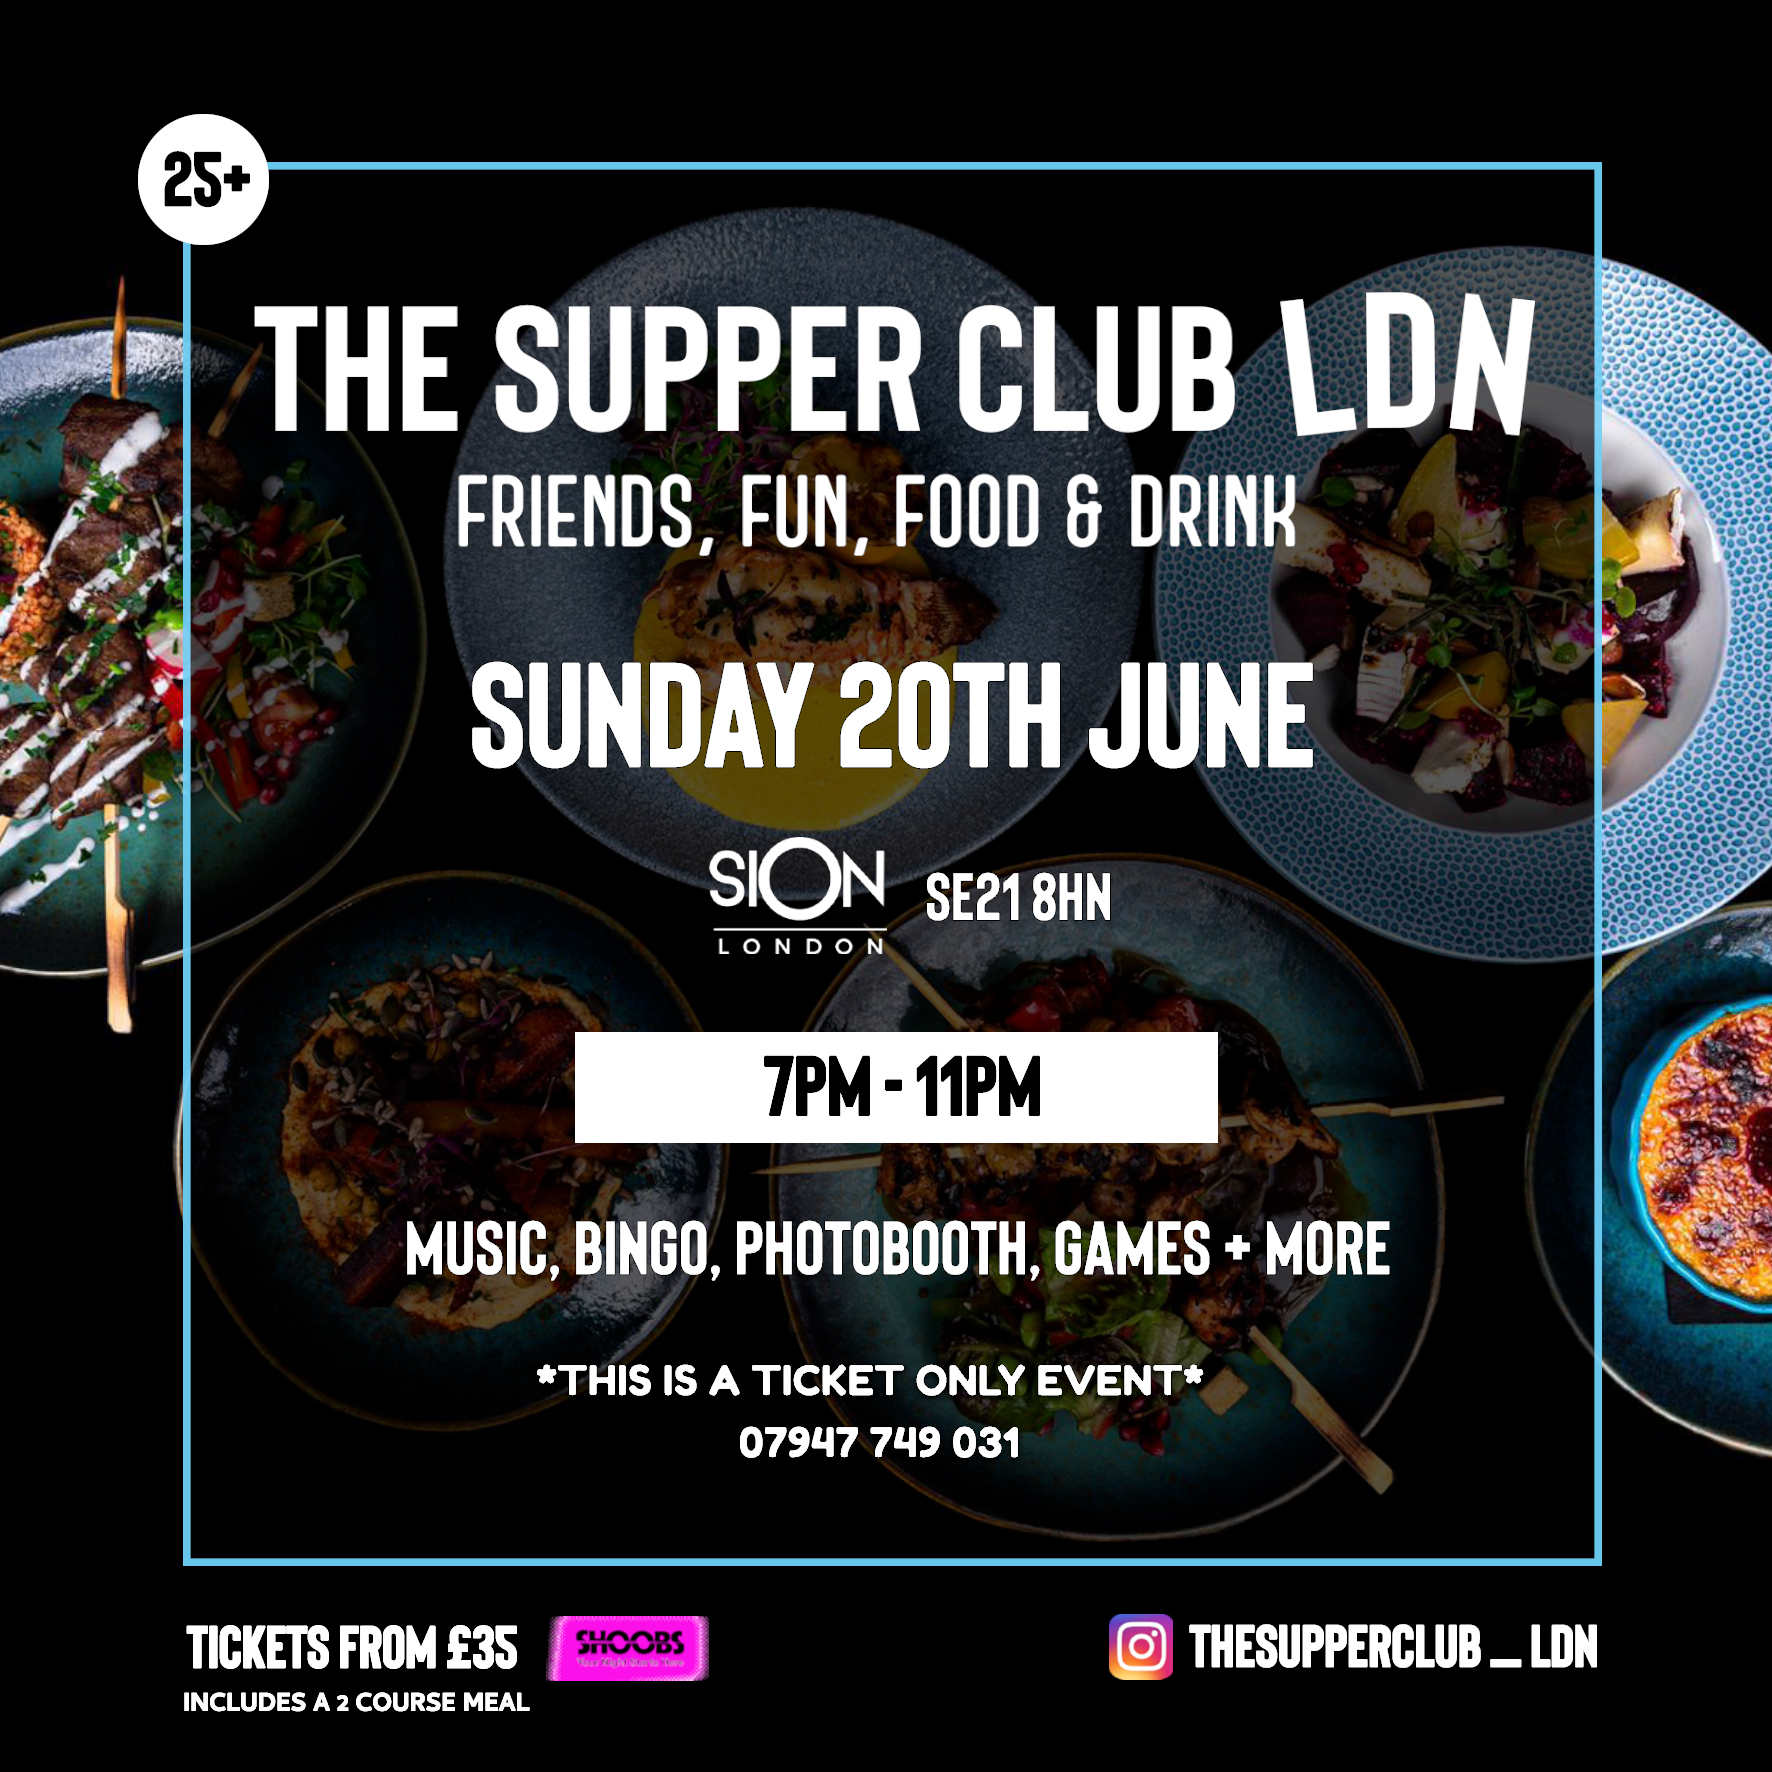 The SupperClub LDN - Sun JUNE 20TH (7pm-11pm)